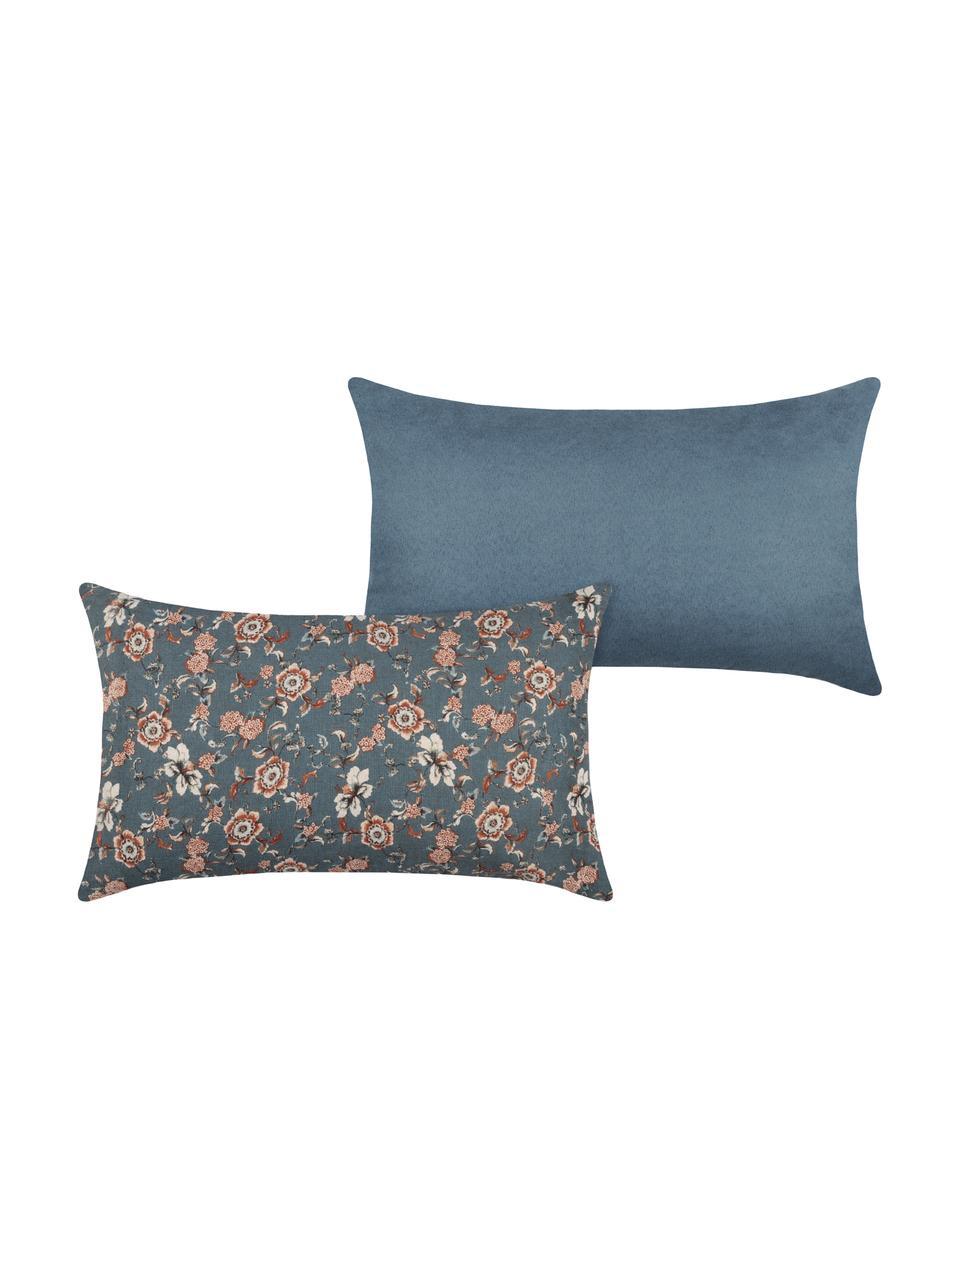 Cuscino con imbottitura Boudoir, Rivestimento: 50% cotone, 15% lana, 35%, Blu, beige, rosso, Larg. 30 x Lung. 50 cm